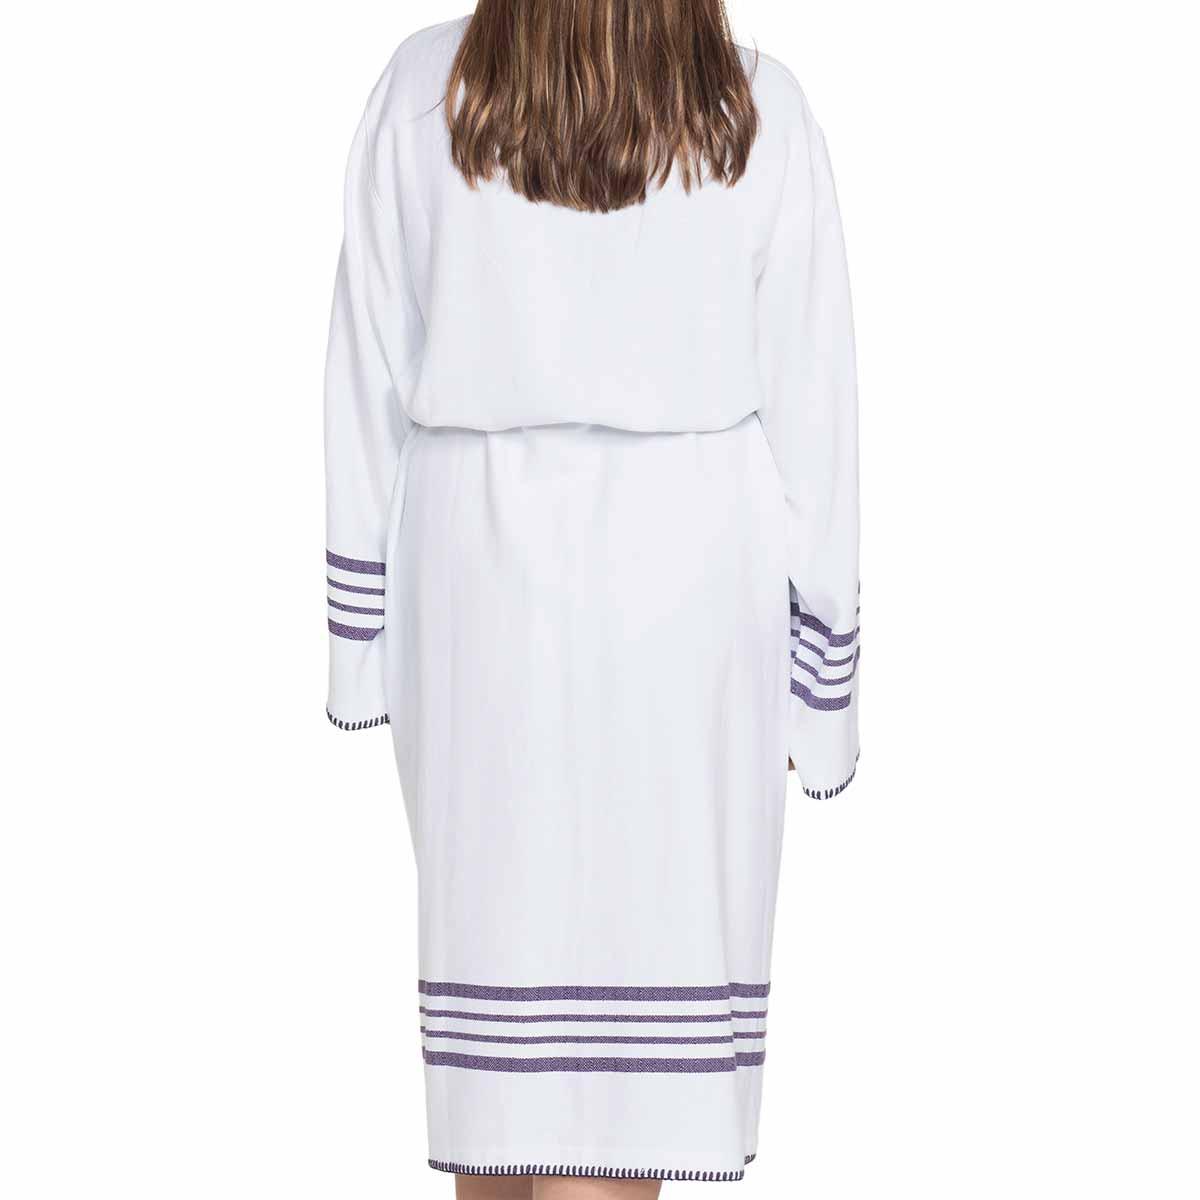 Bathrobe White Sultan - Purple Stripes